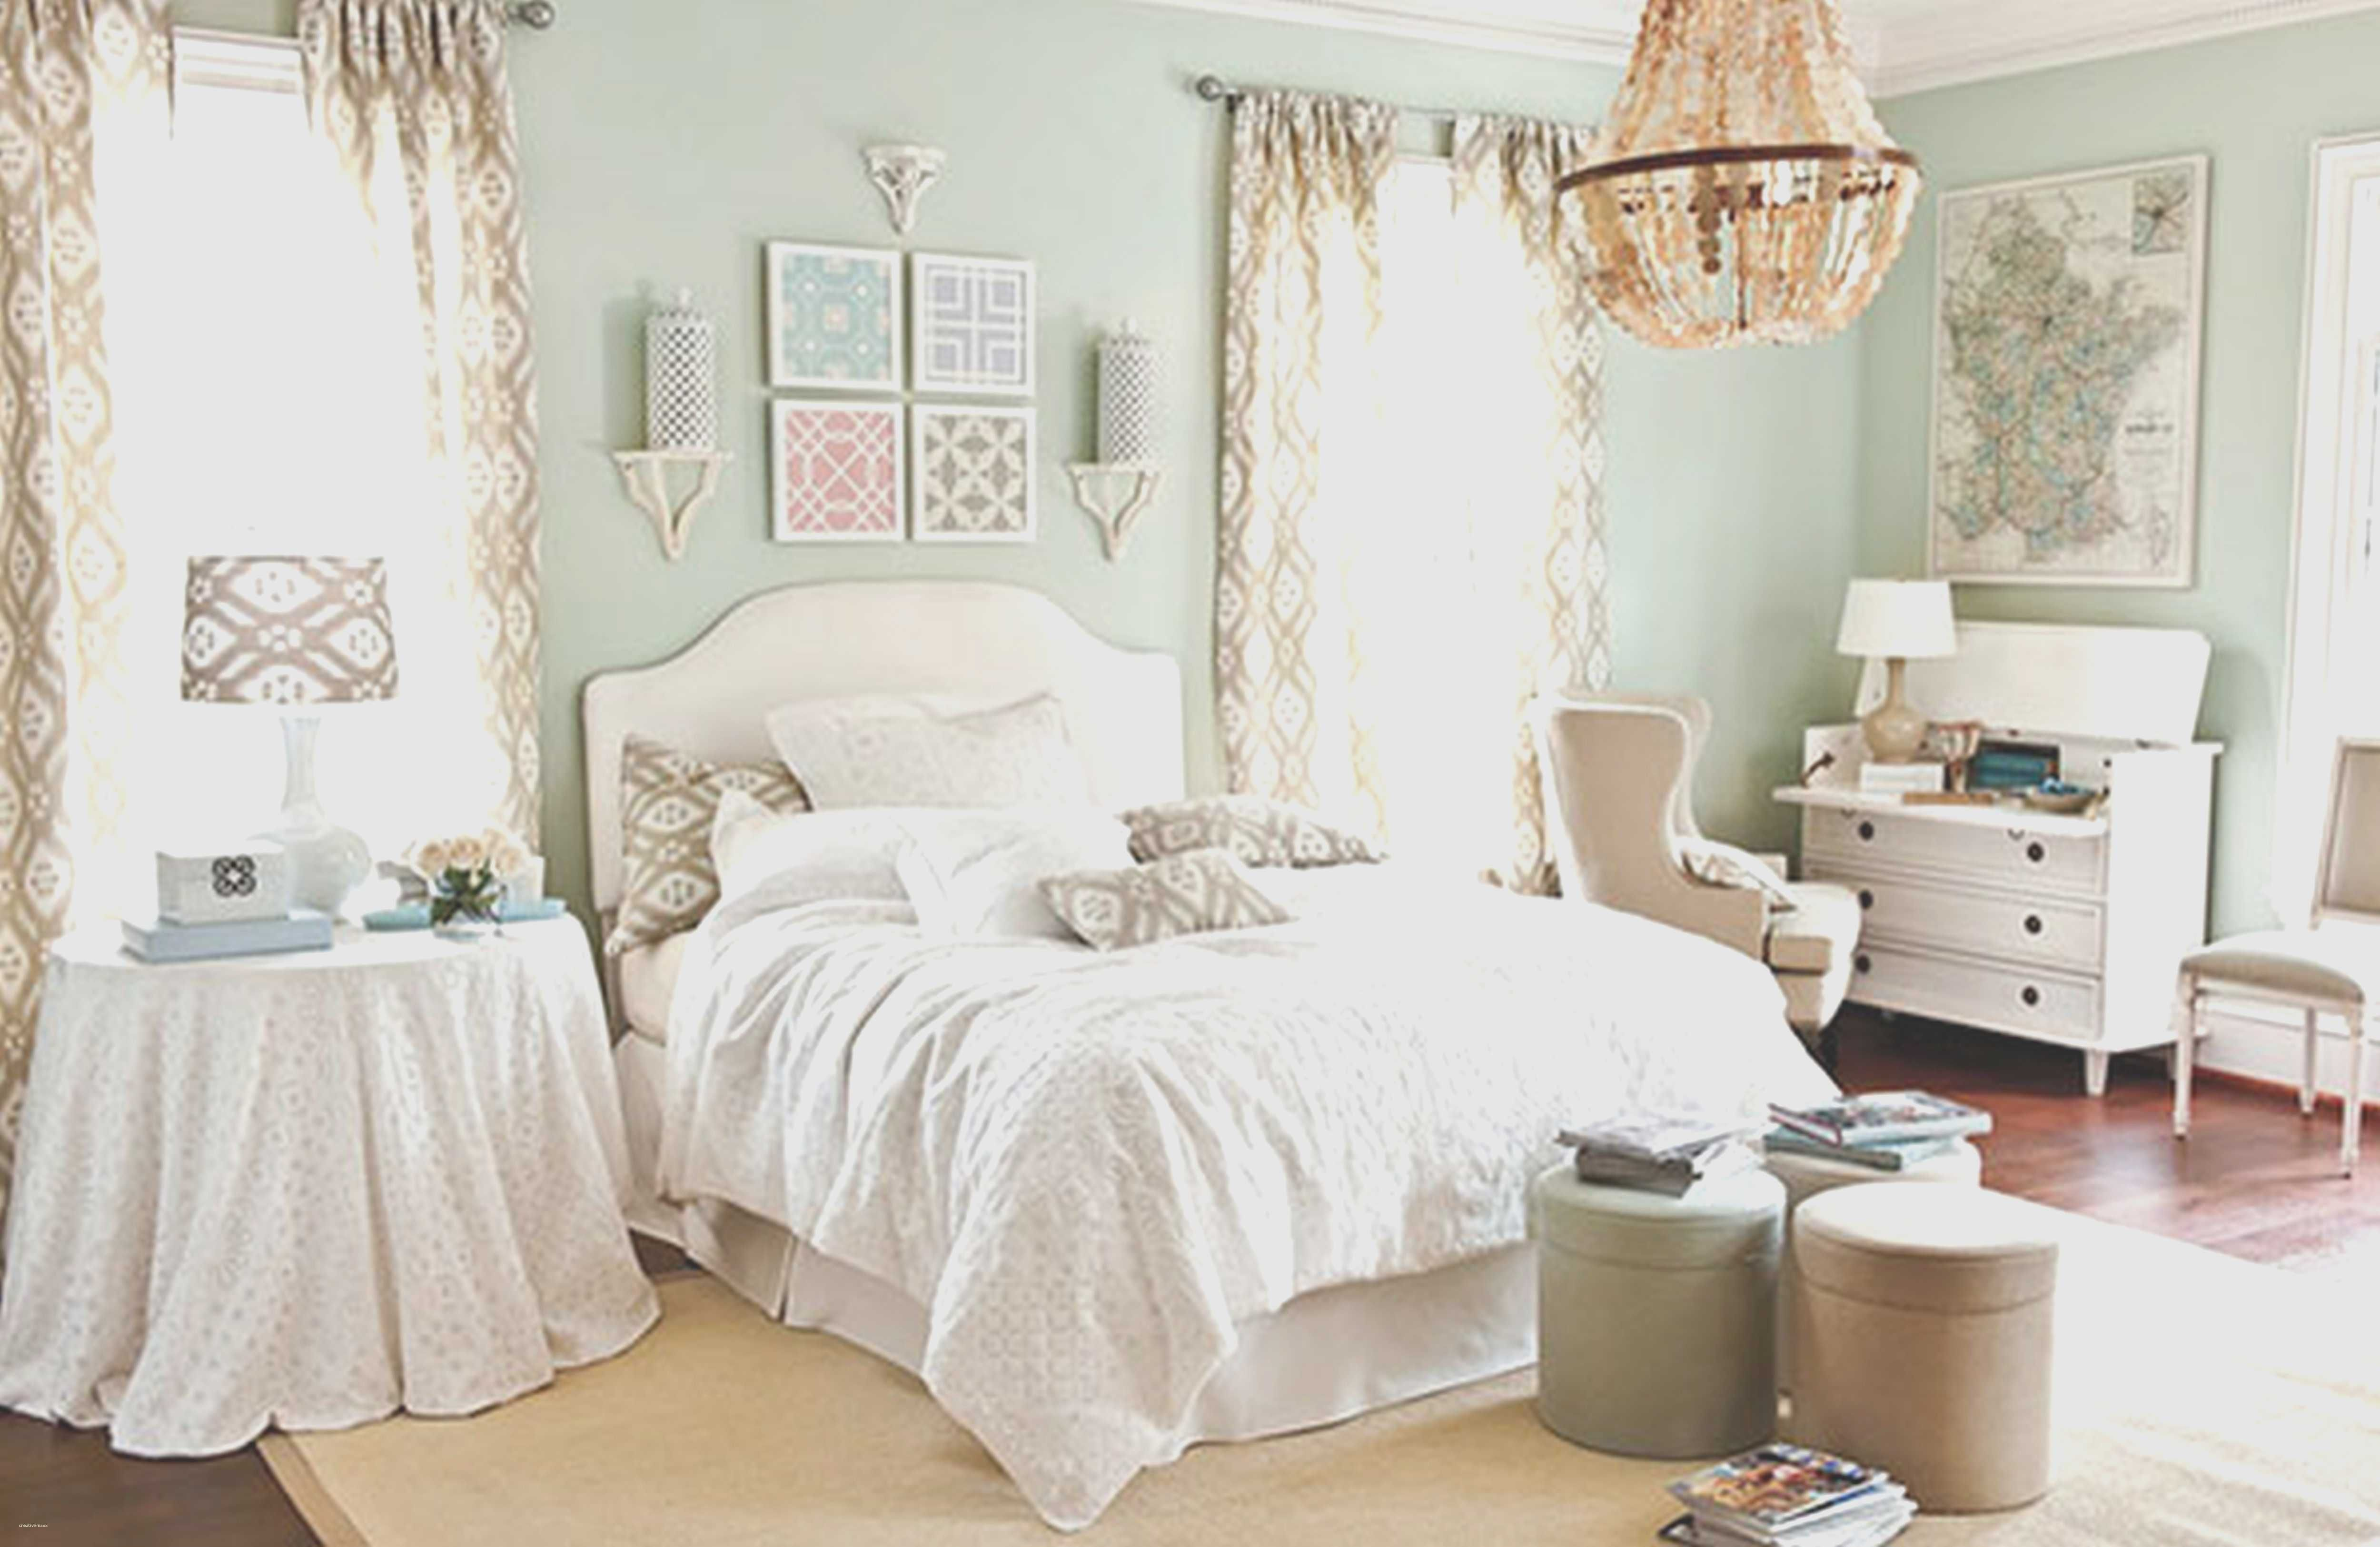 bedroom ideas for teenage girls vintage. Brilliant Bedroom Bedroom Ideas For Teenage Girls Vintage  Beautiful  Vintage Chic Modern Teens Room  On For